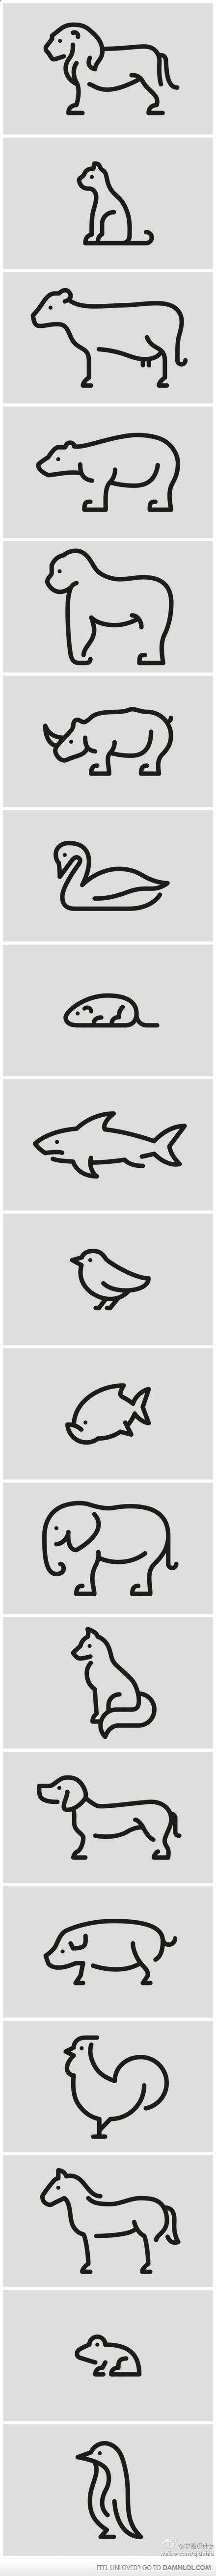 Easy To Draw Animals - Damn! LOL